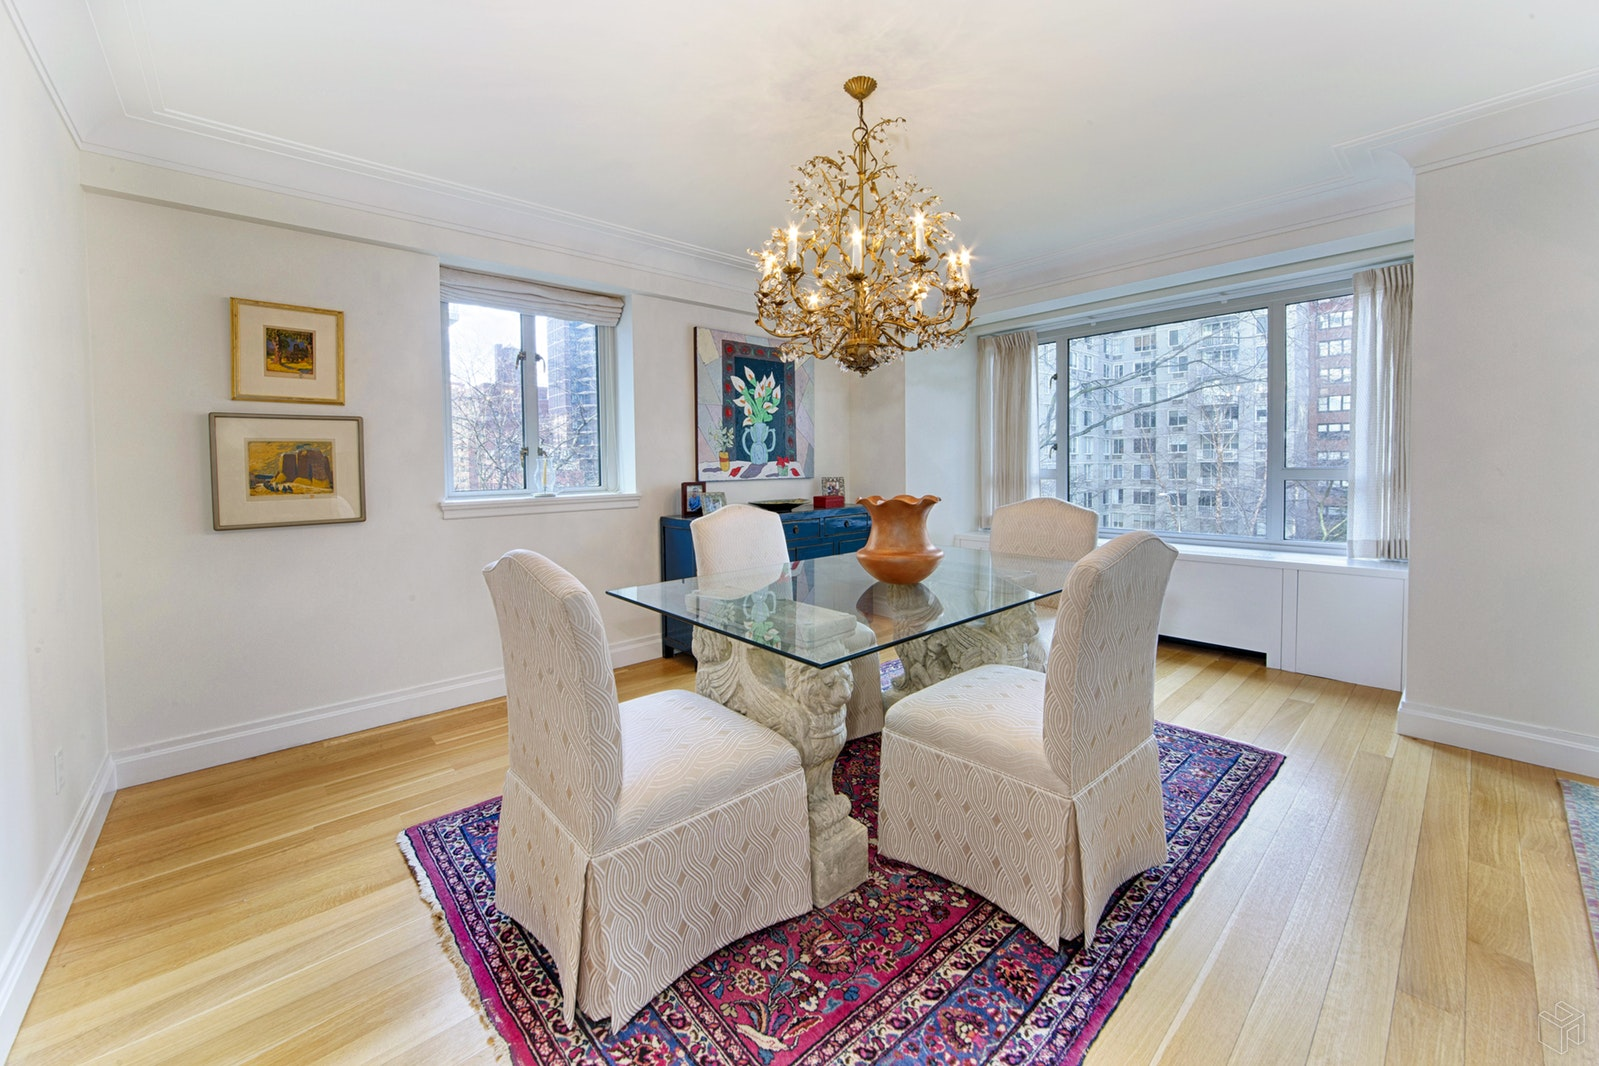 200 EAST 66TH STREET C404, Upper East Side, $2,600,000, Web #: 19454202